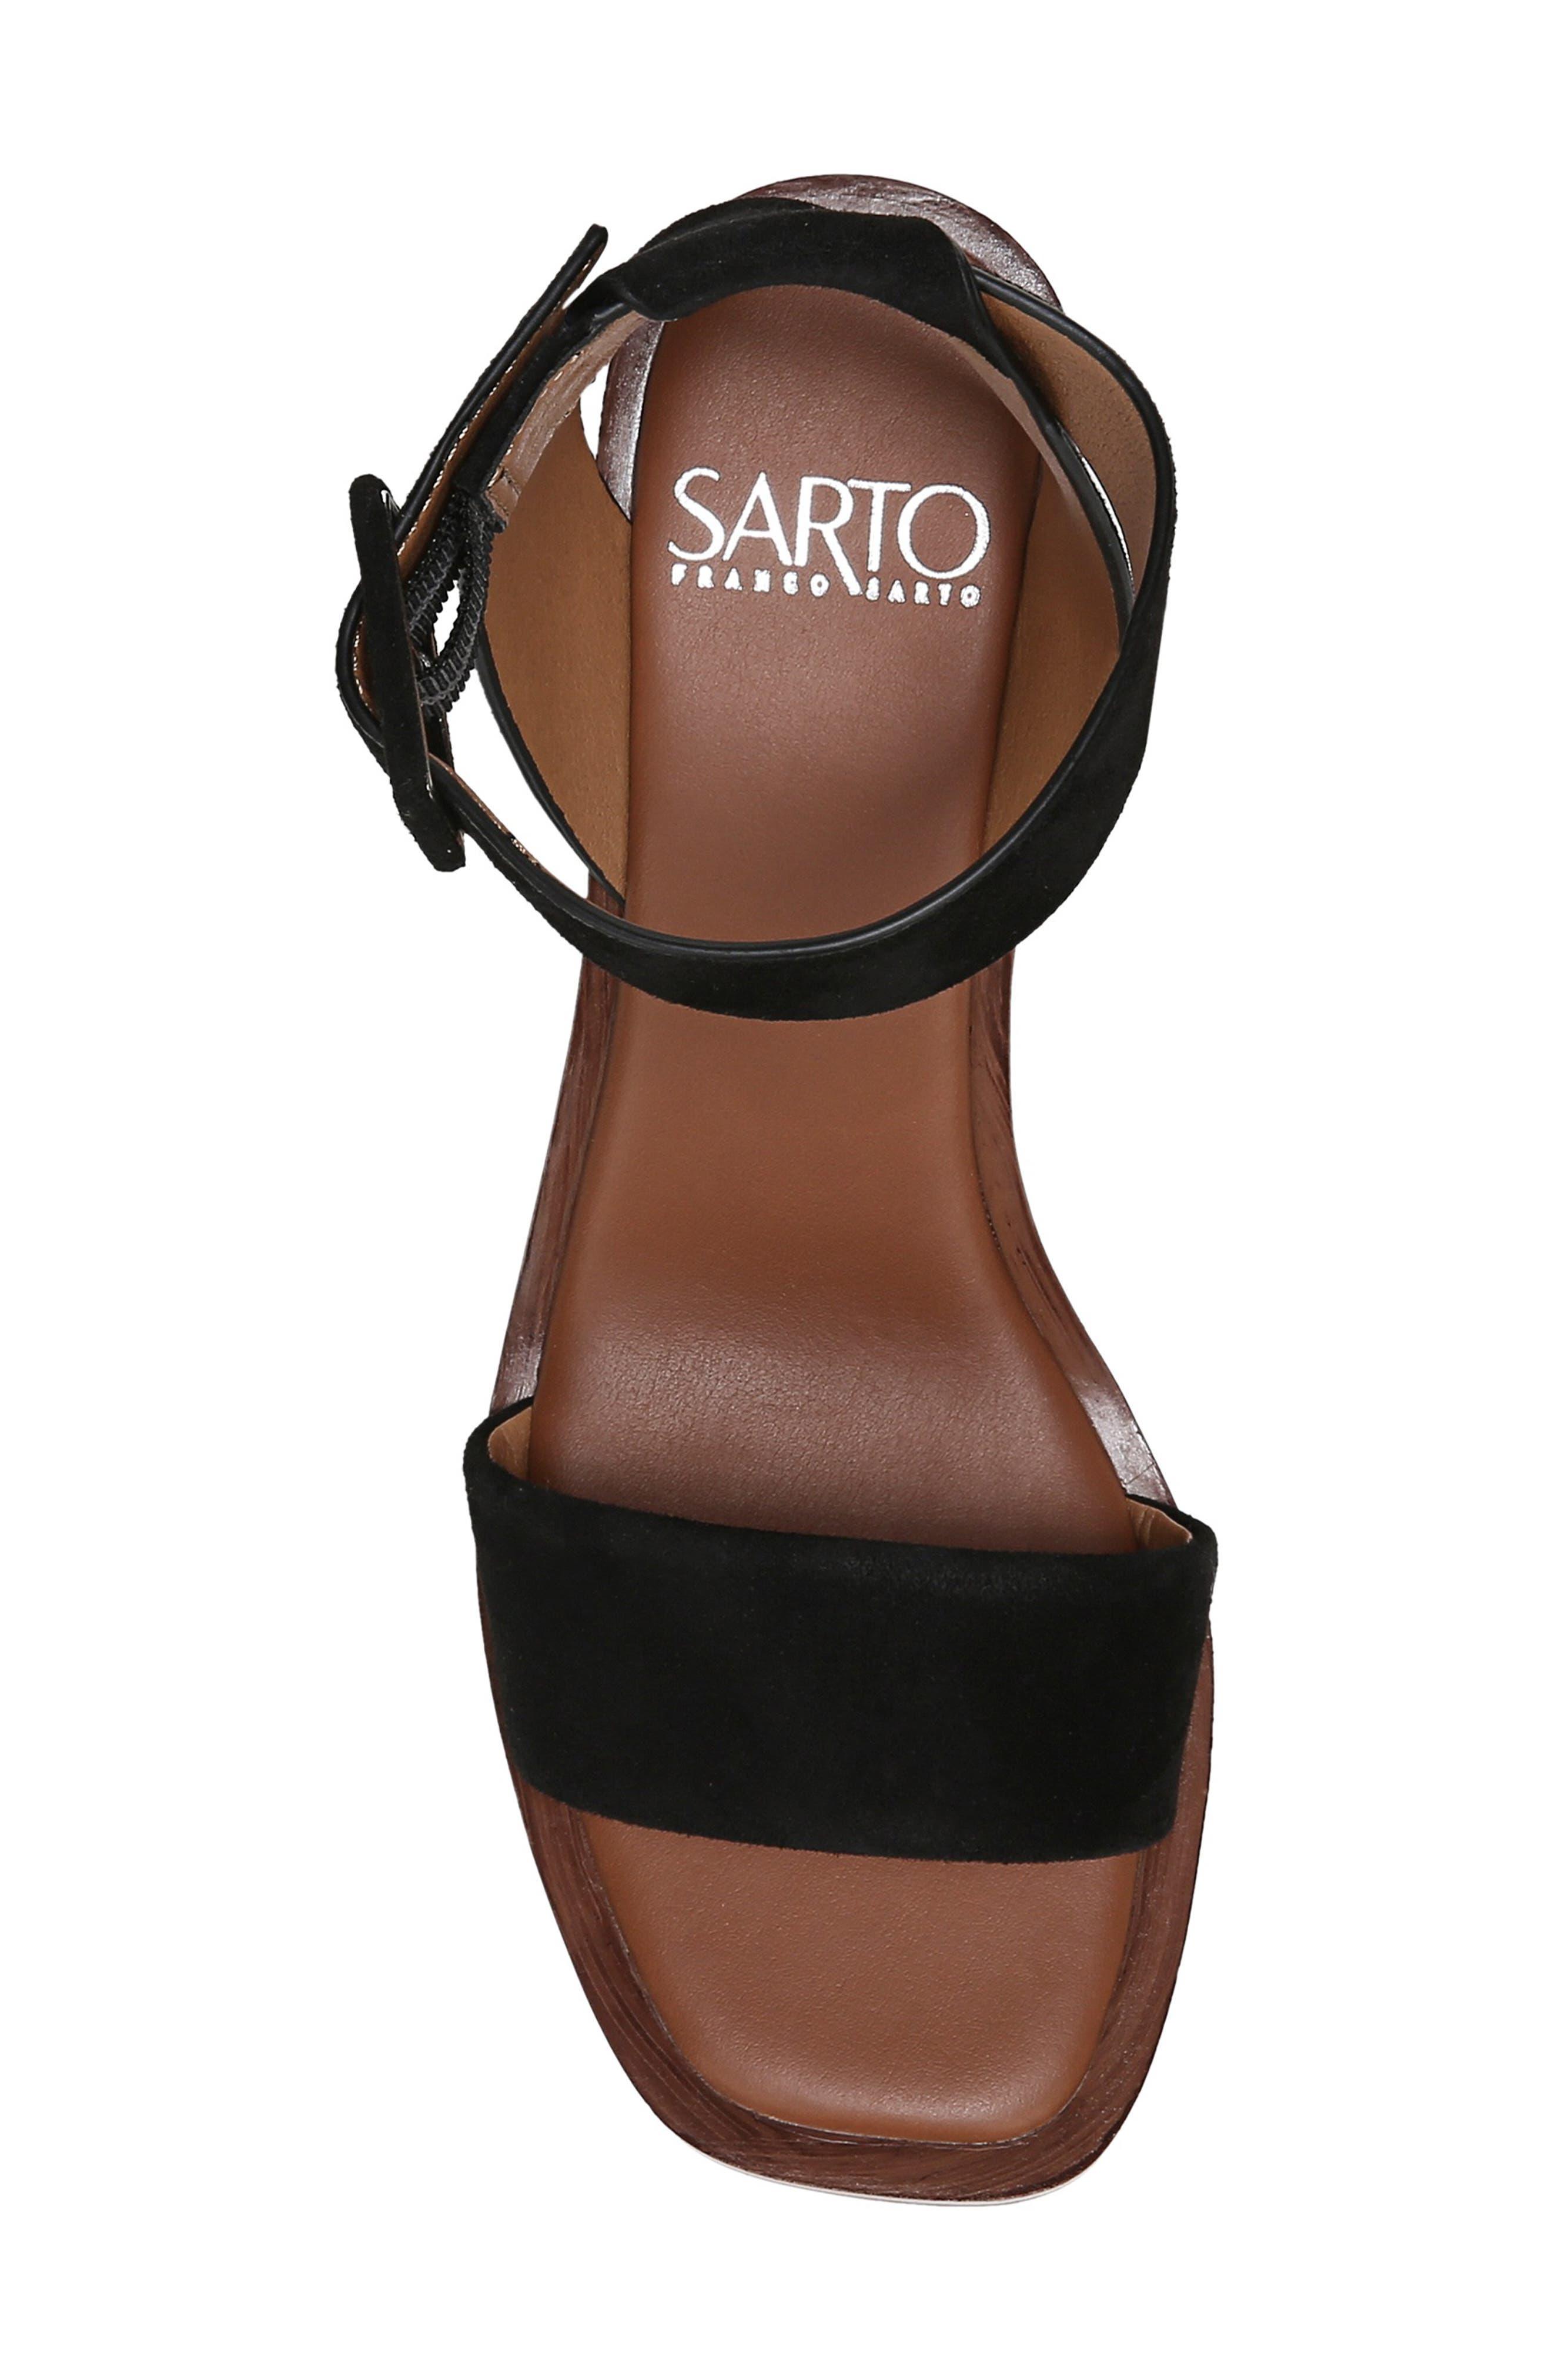 SARTO BY FRANCO SARTO, Risa Strap Sandal, Alternate thumbnail 5, color, BLACK SUEDE